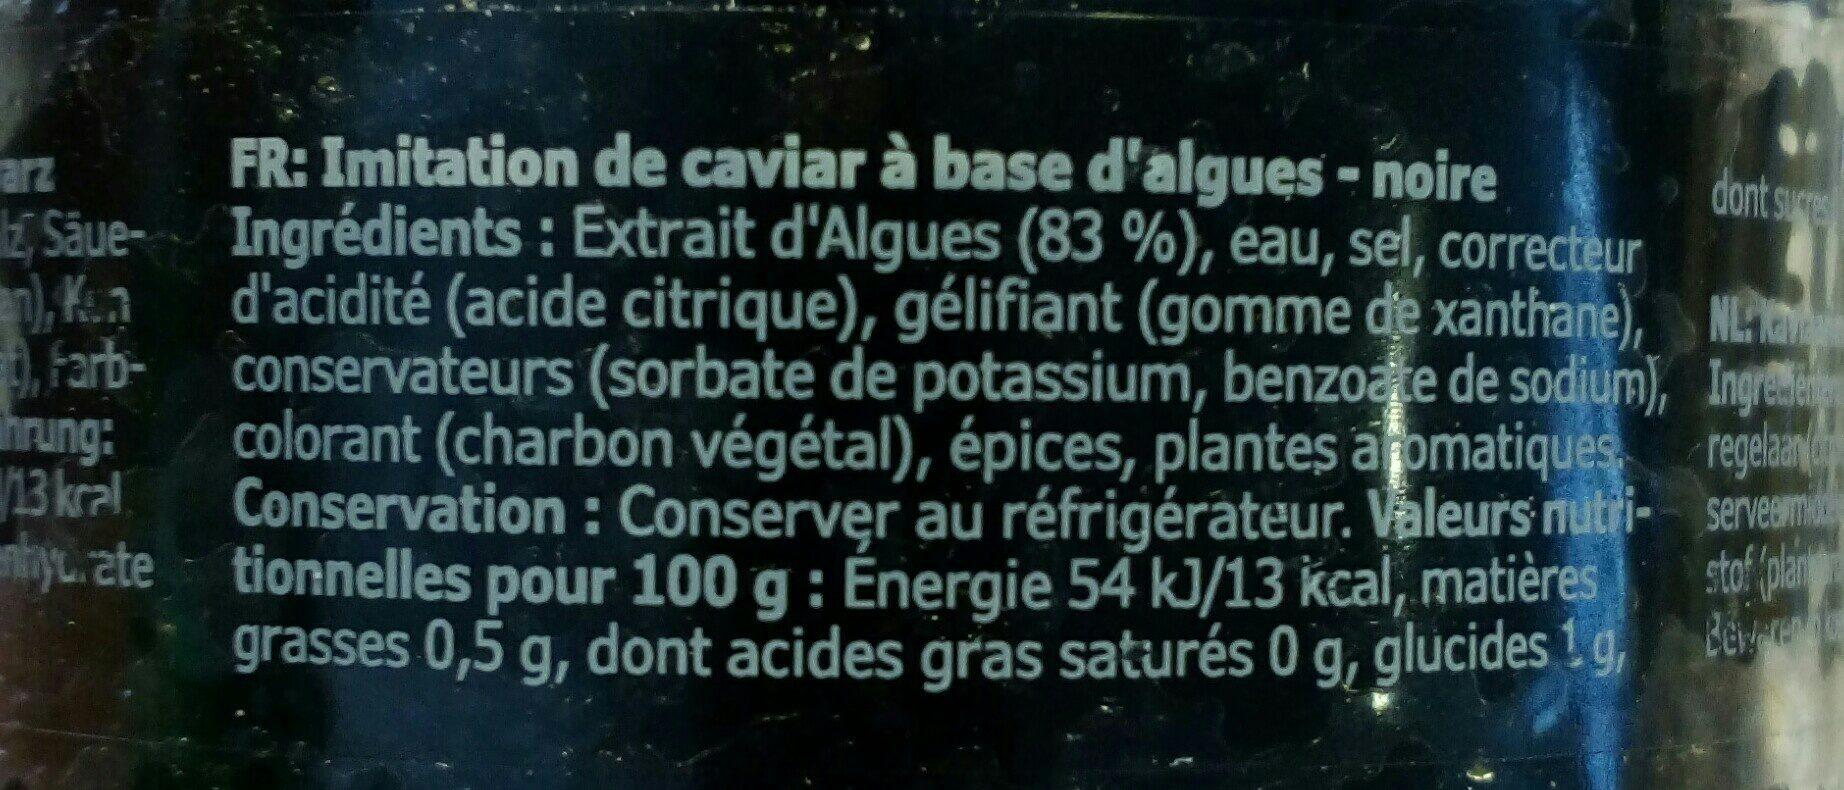 Sjorapport imitacion caviar ikea - Ingredients